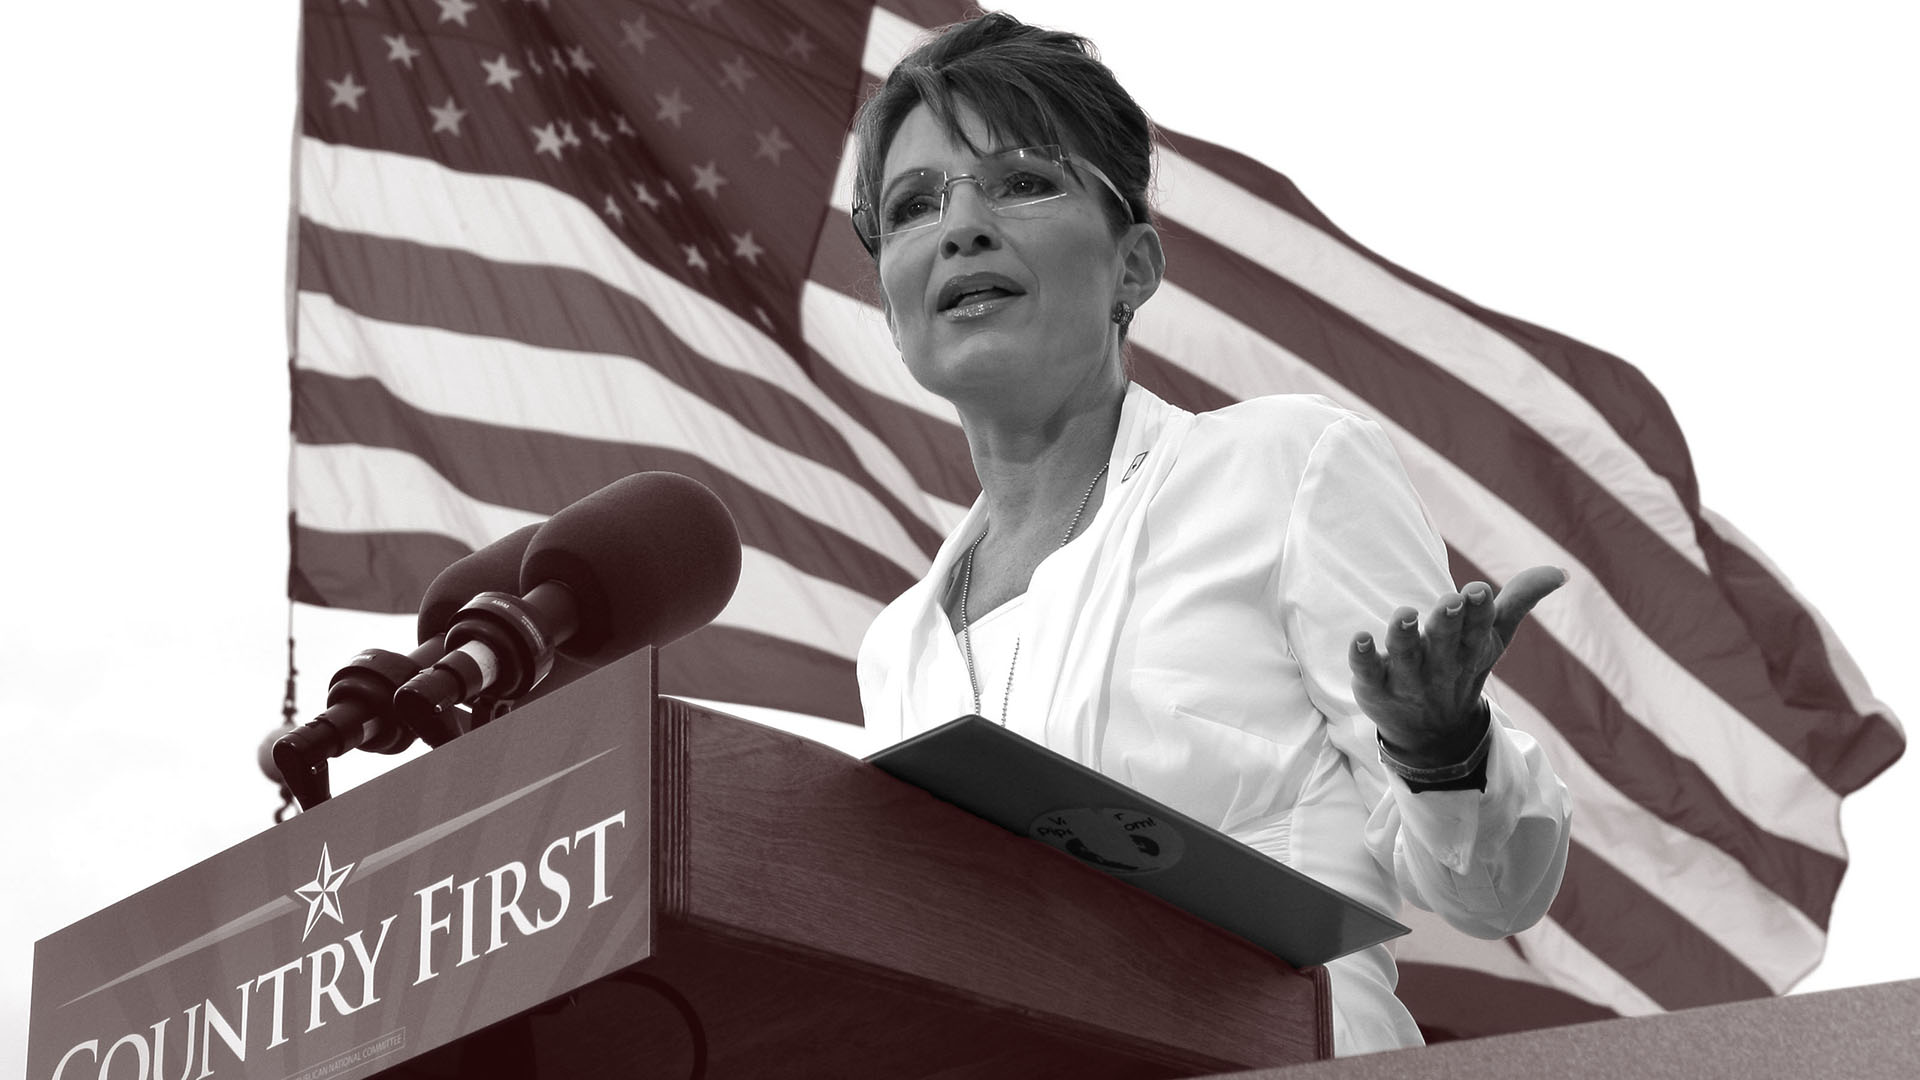 Sarah Palin | Bio & Timeline